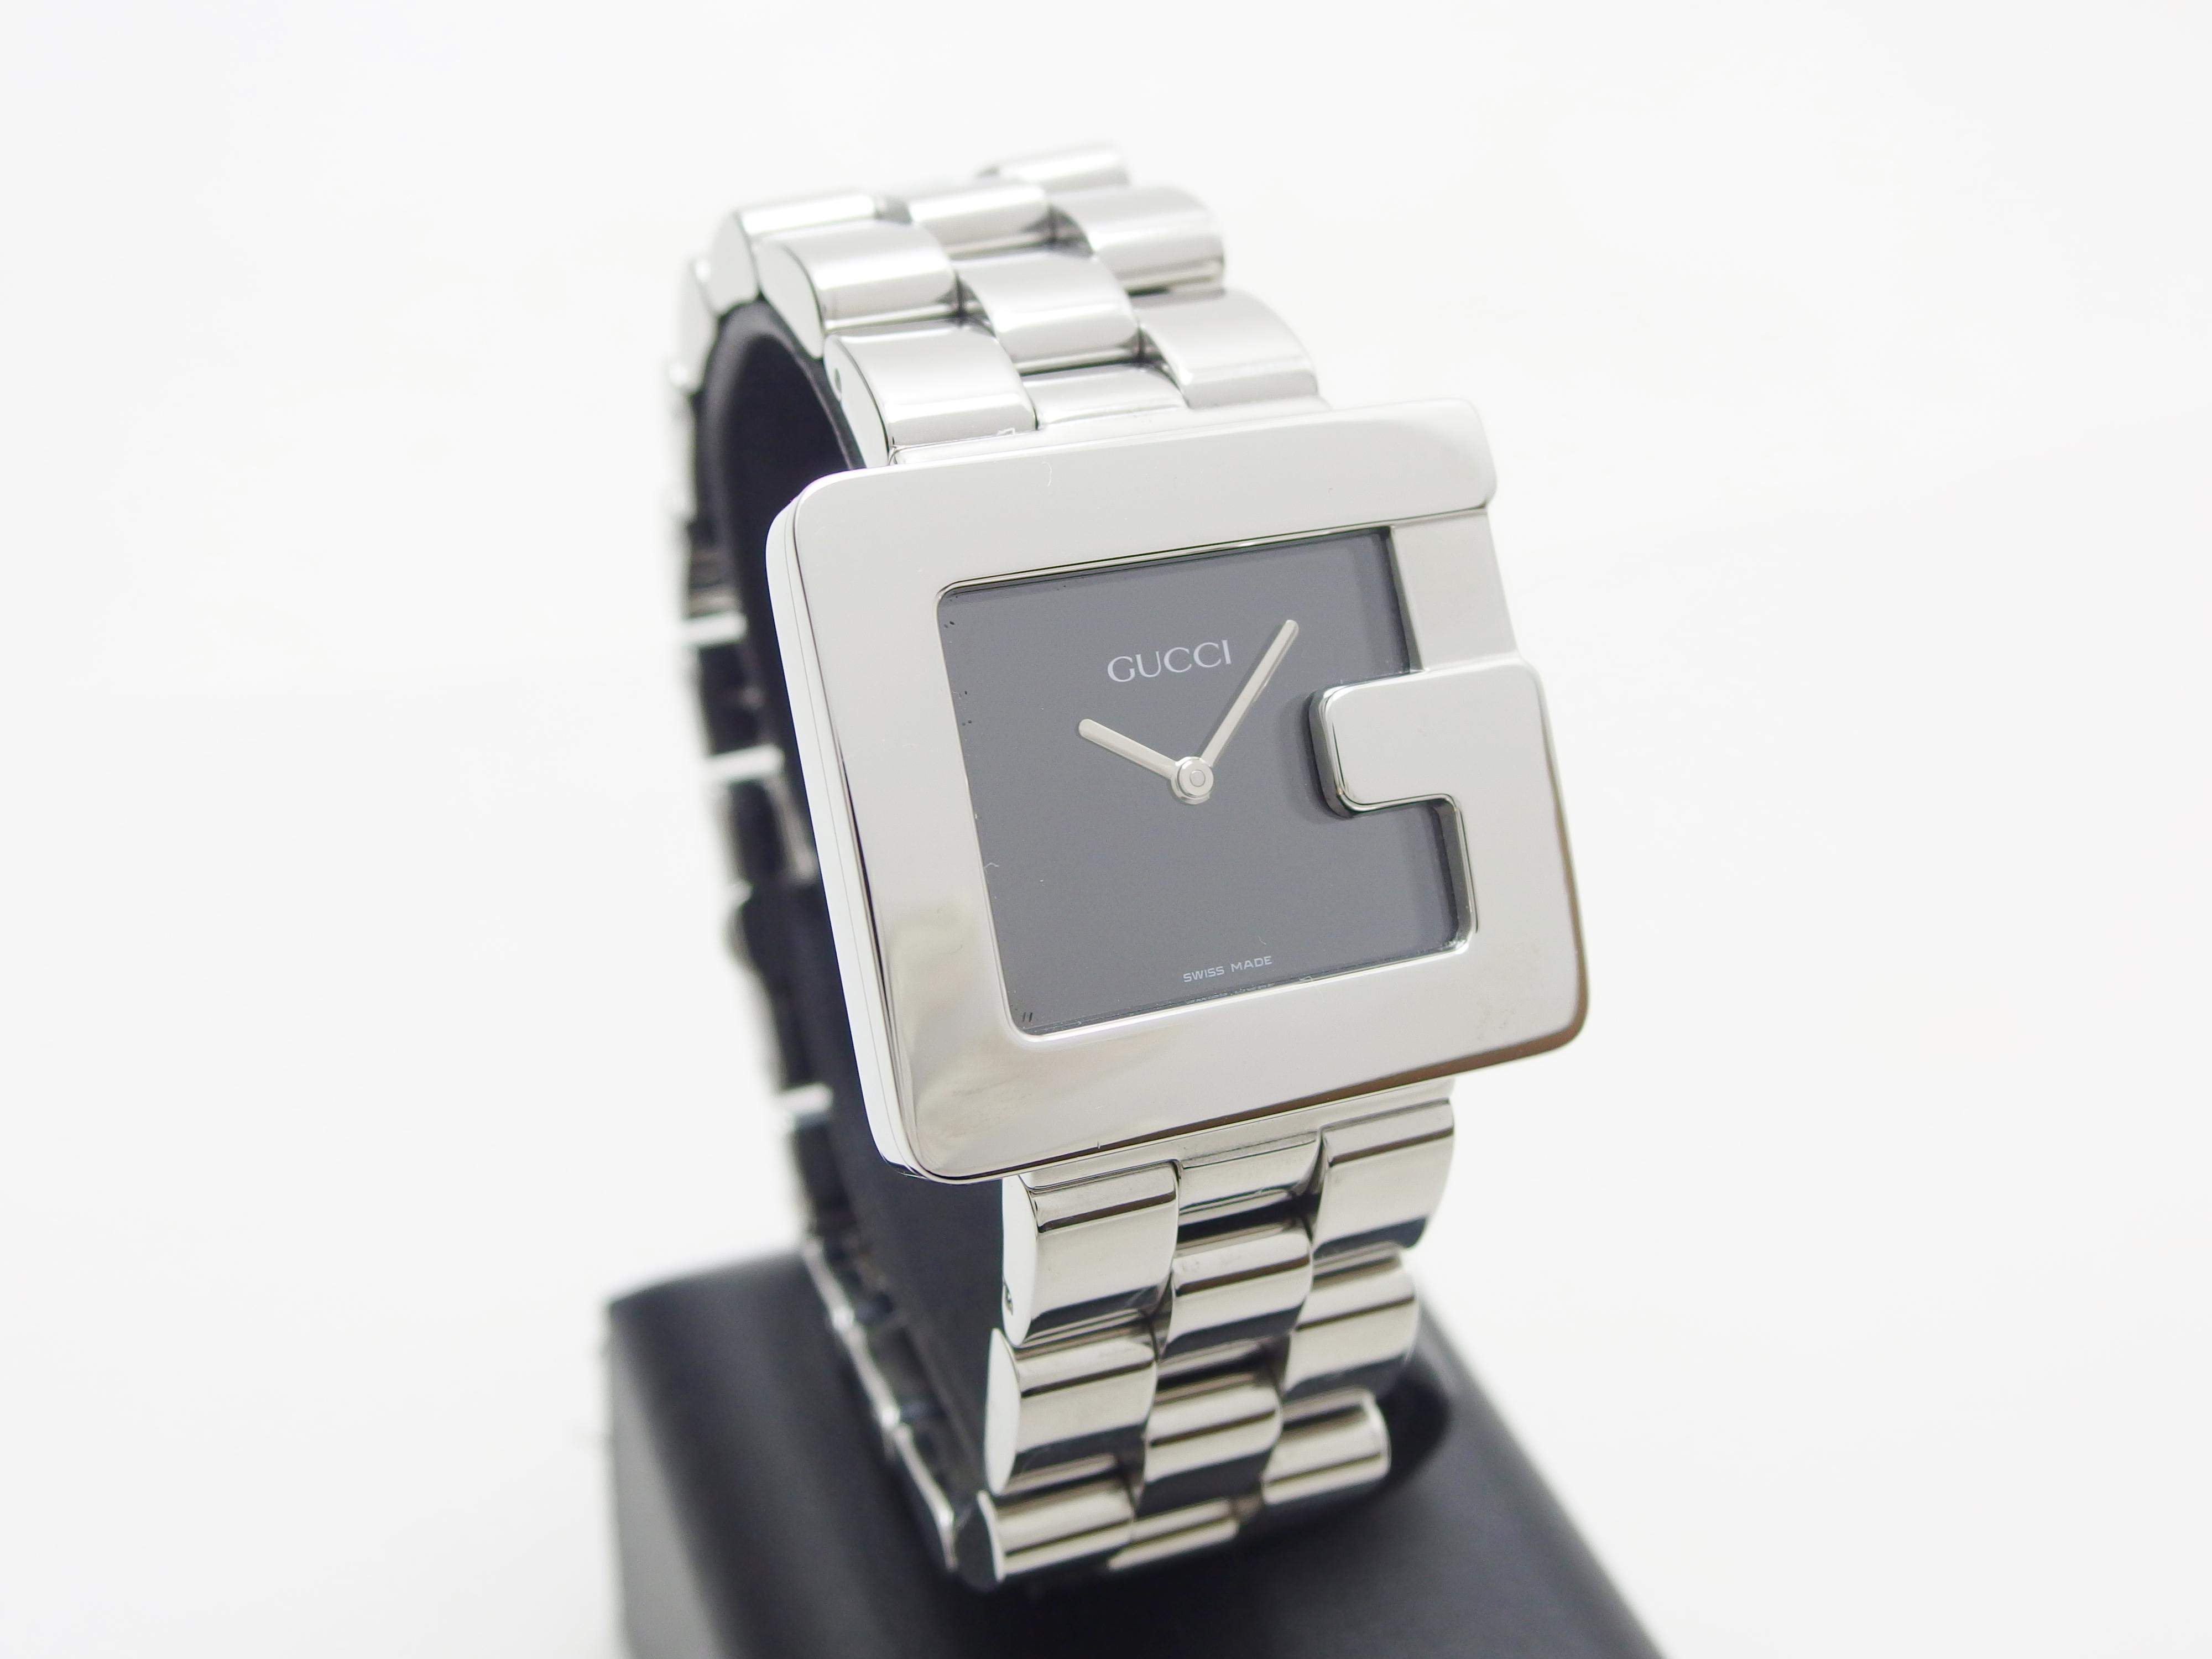 GUCCI グッチ 腕時計 メンズ クオーツ SS 黒文字盤 【435】